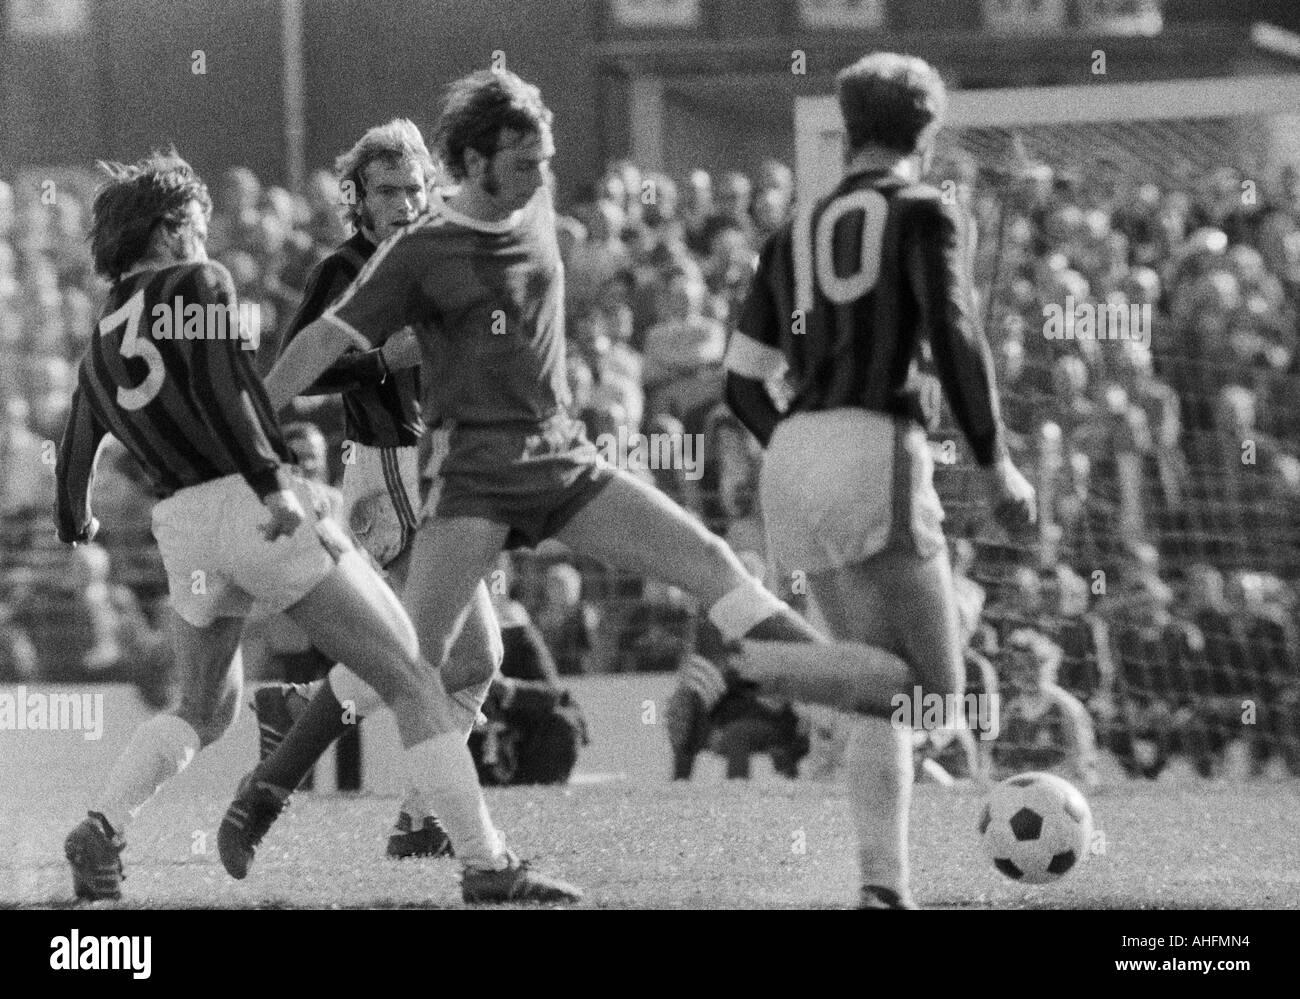 football, Bundesliga, 1971/1972, VfL Bochum versus Hanover 96 2:2, Stadium at the Castroper Strasse in Bochum, scene of the match, f.l.t.r. Rainer Stiller (96), Peter Ruehmkorb (96), Werner Balte (Bochum), Hans Siemensmeyer (96) - Stock Image